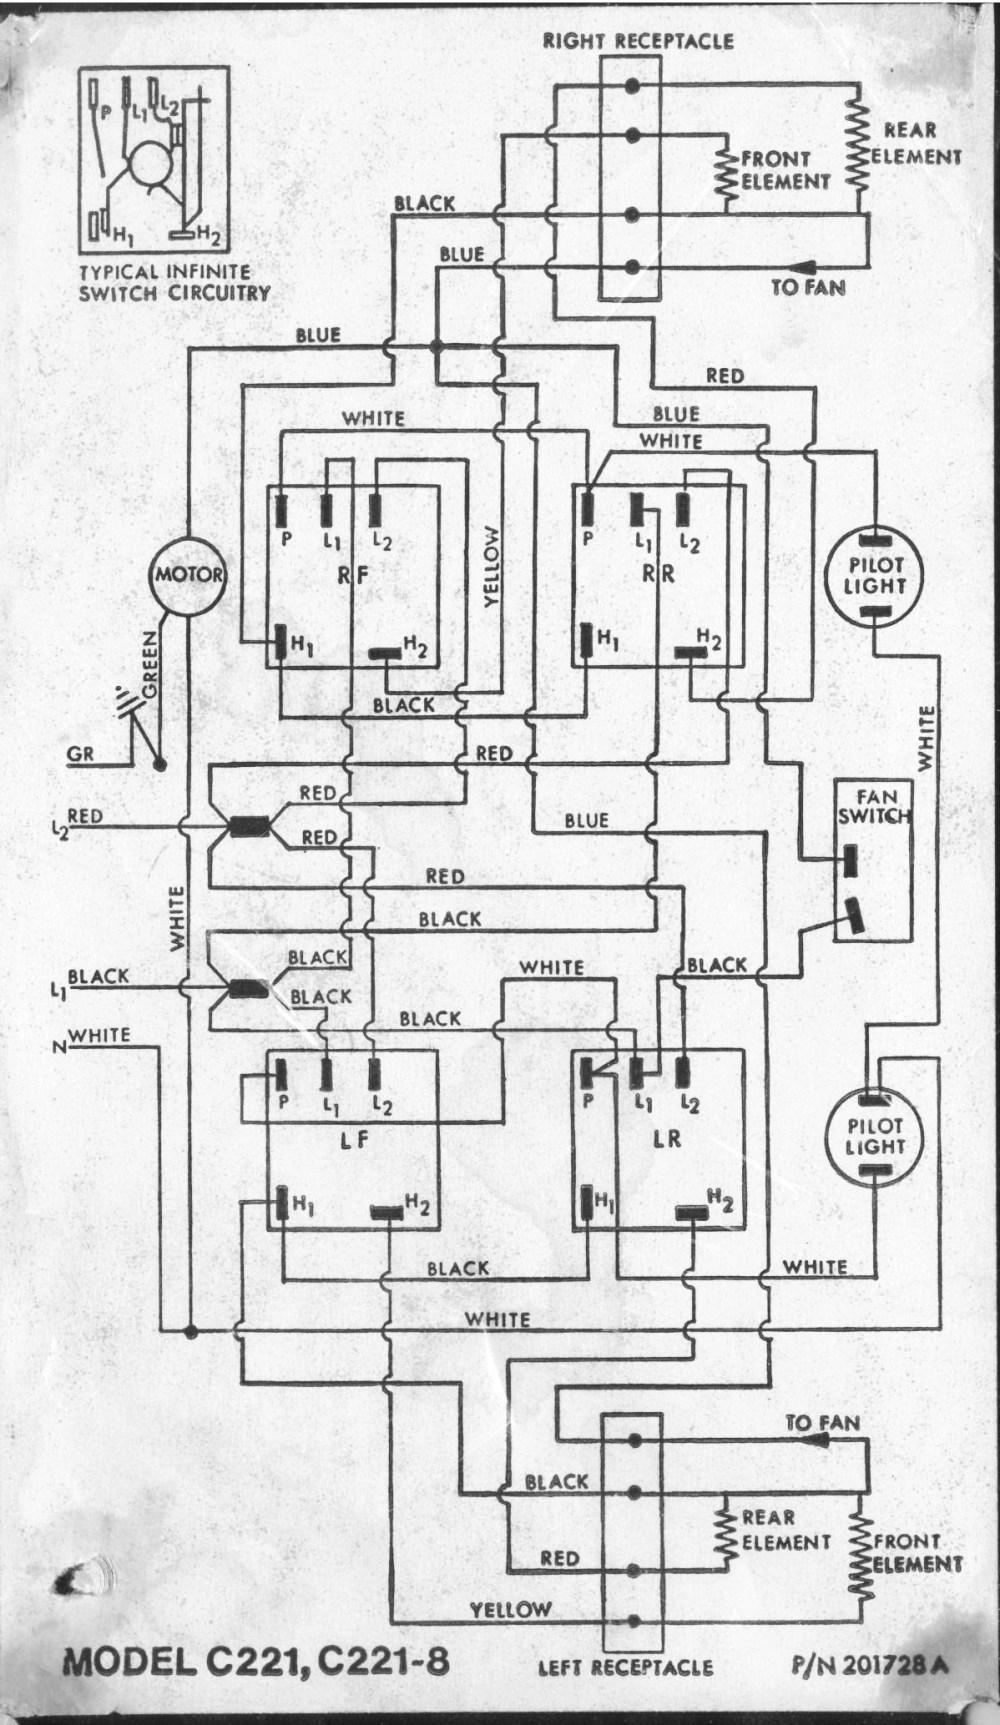 medium resolution of edit here is the wiring diagram c221 wiring diagram